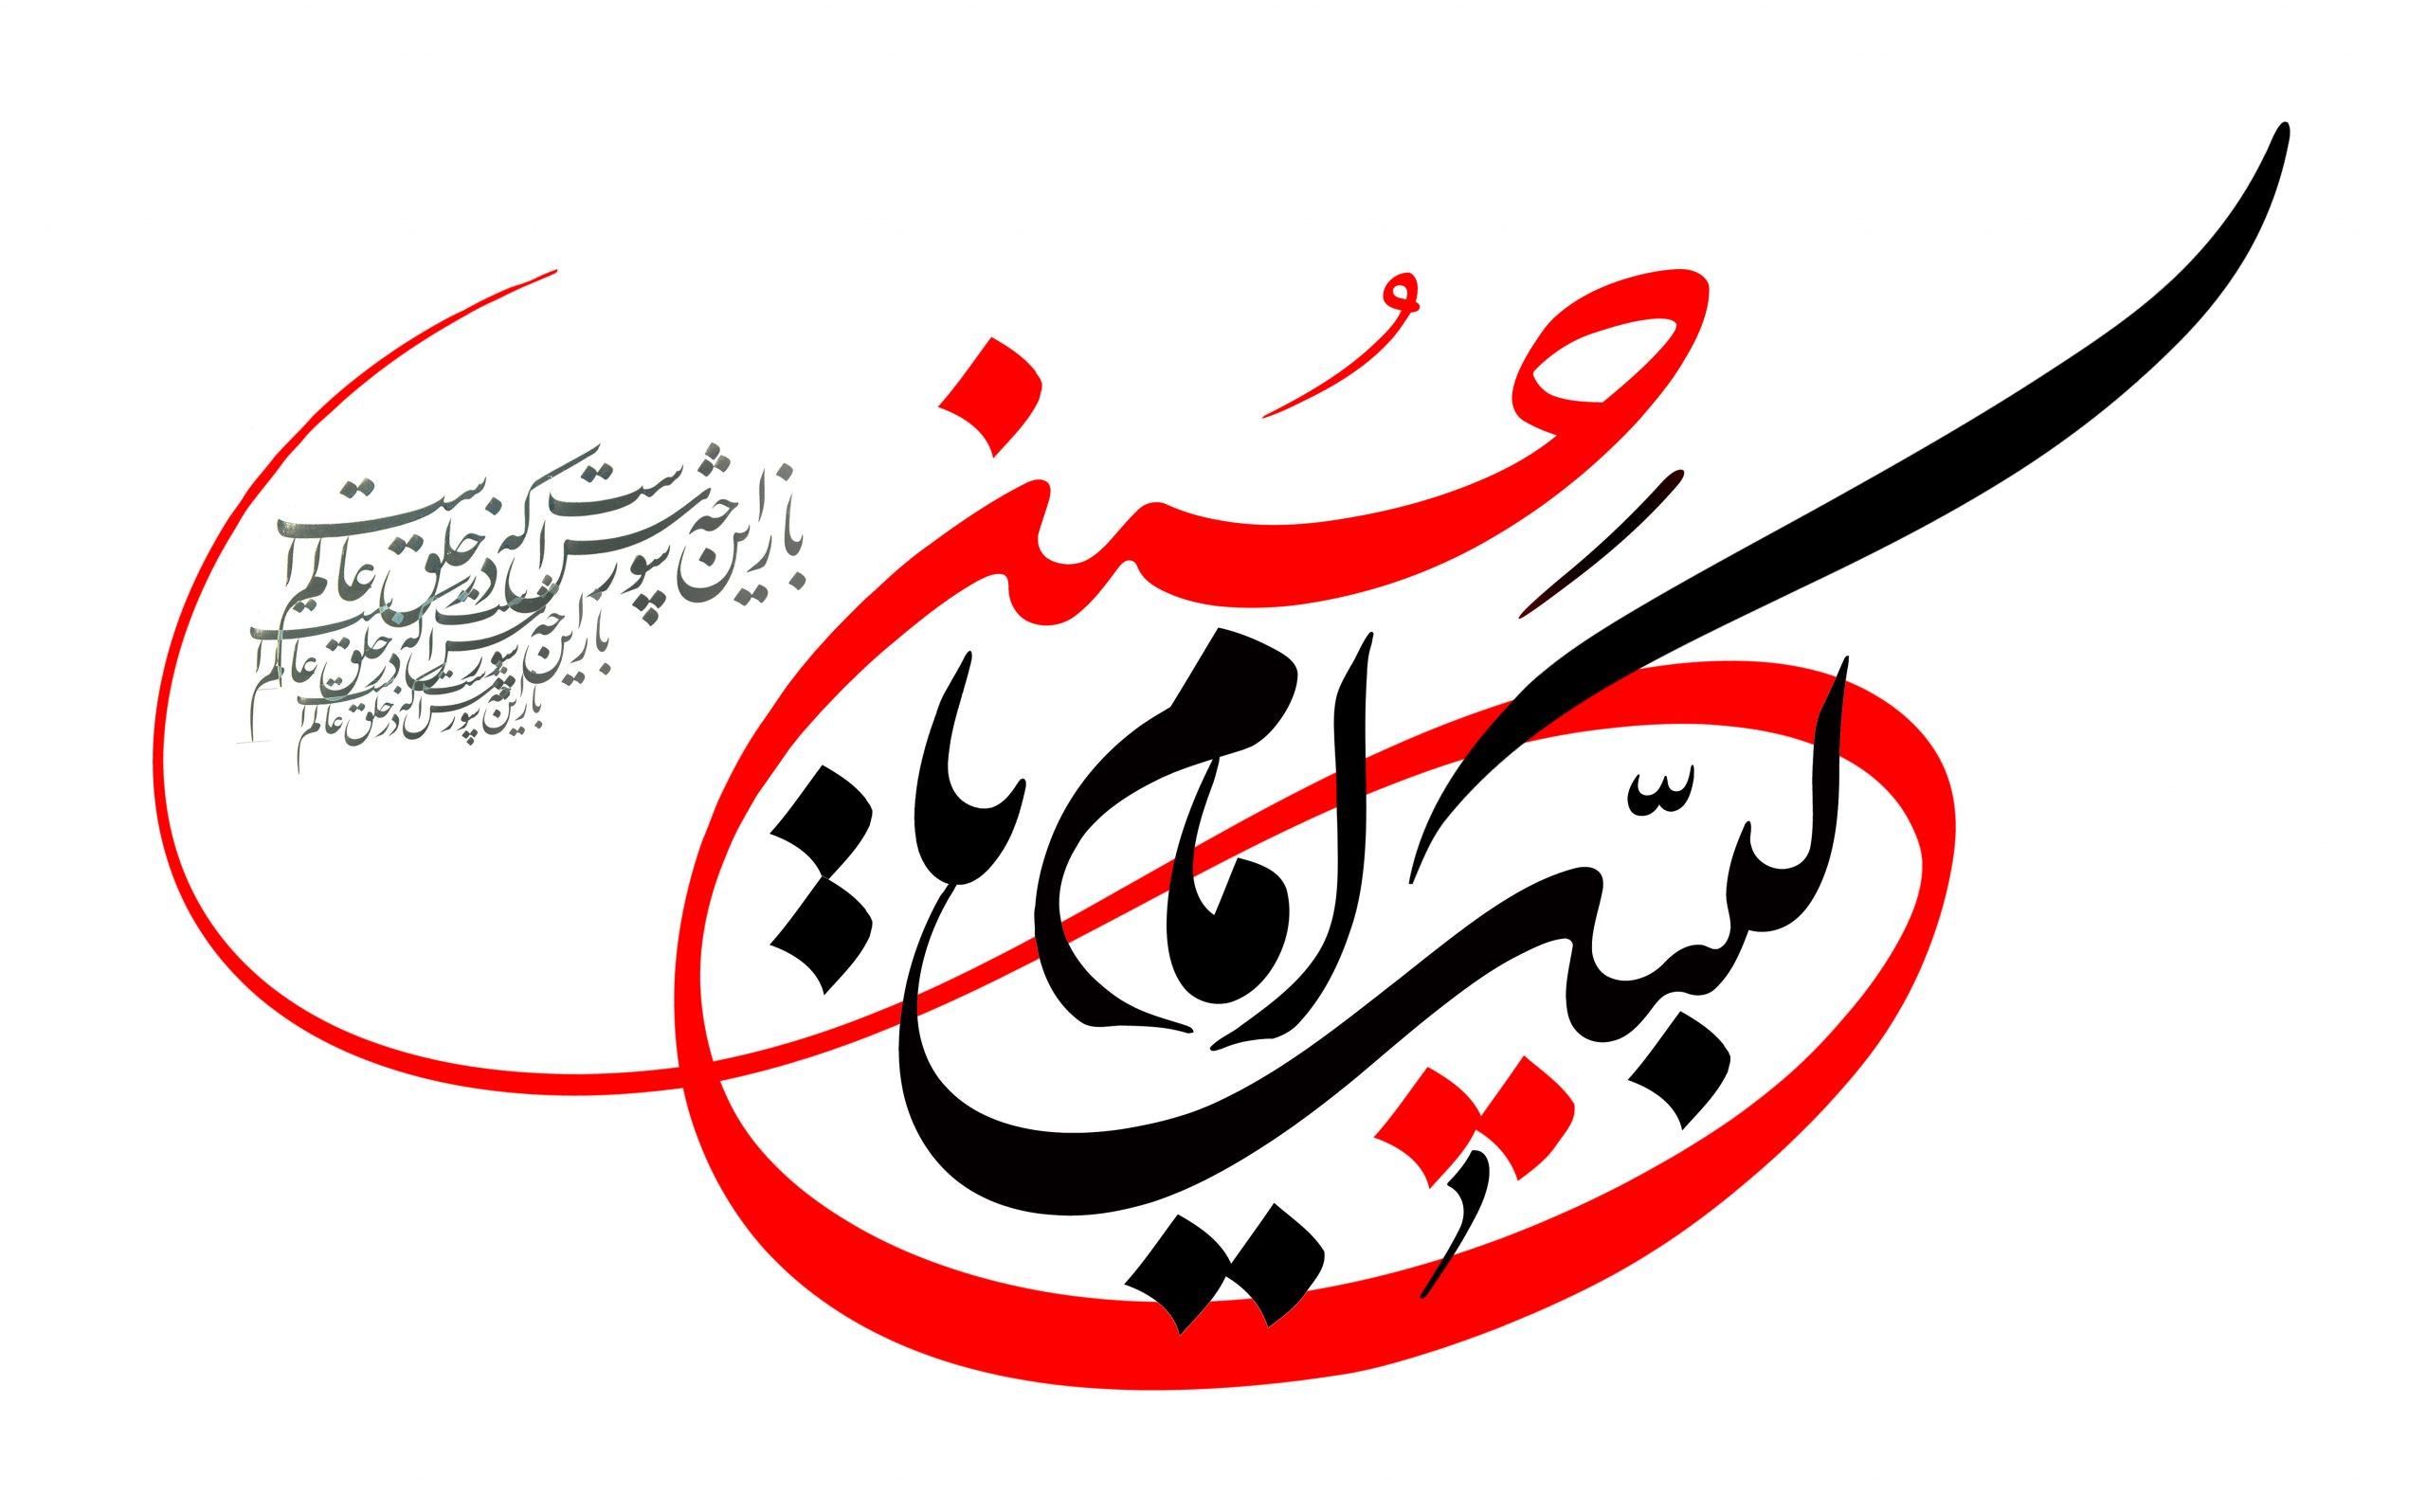 نماهنگ محرمی دبیرستان علم الهدی نجف آباد+فیلم